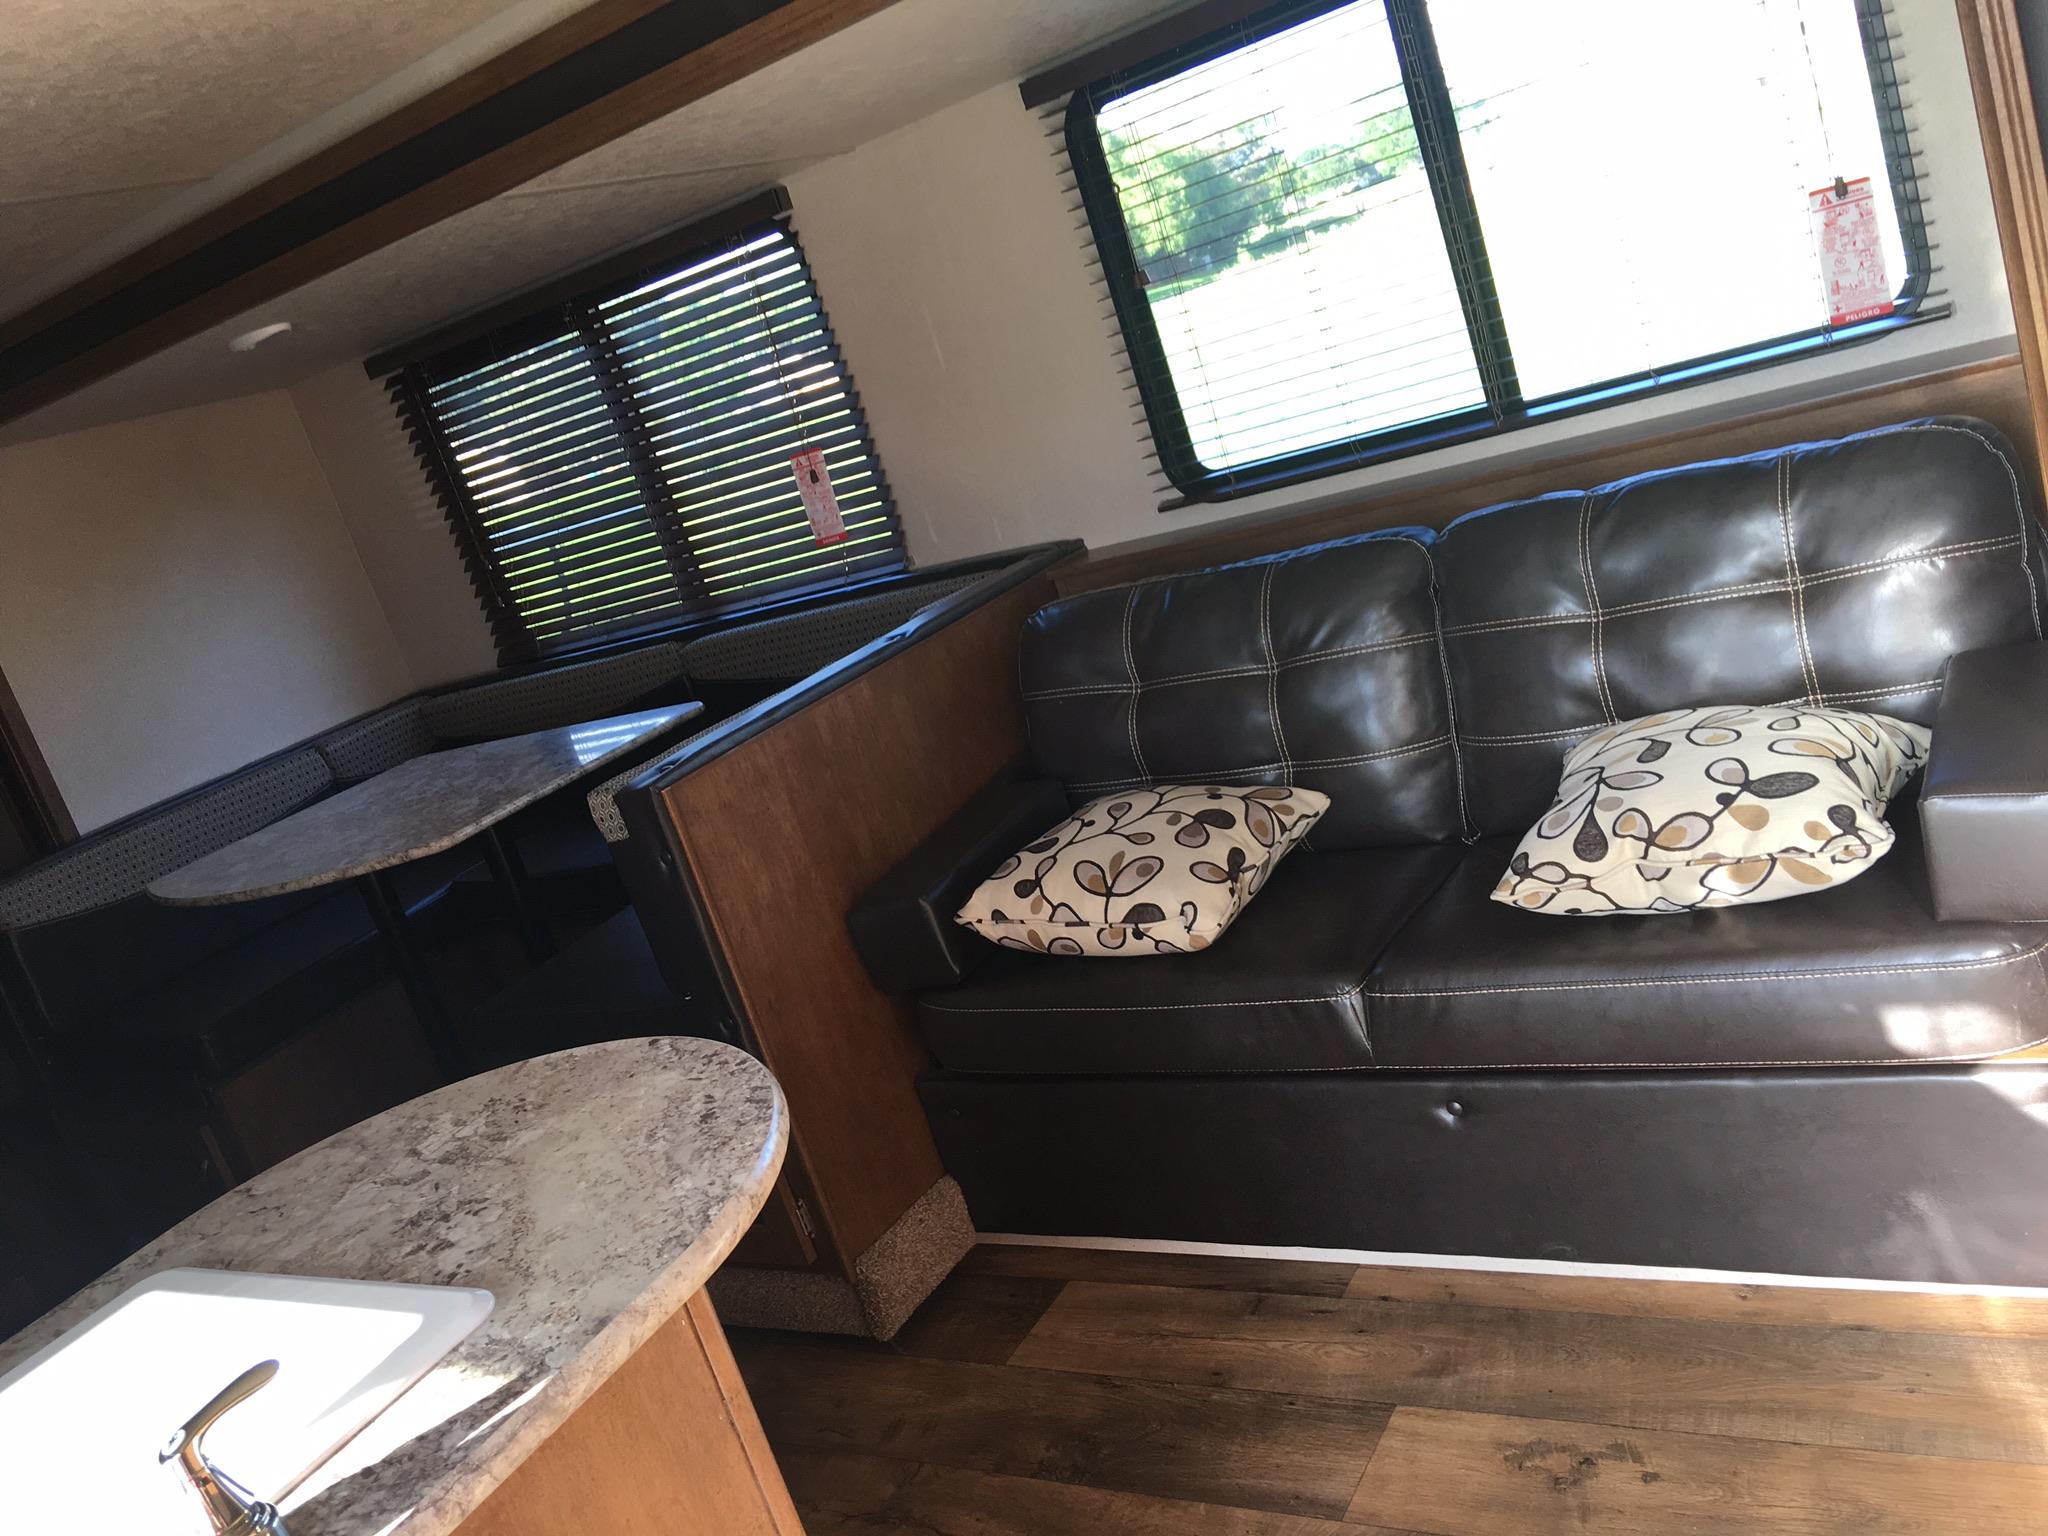 U-shaped dinette - storage under benches  Loveseat / storage behind  Both convert to beds . Forest River Salem Cruise Lite 2018